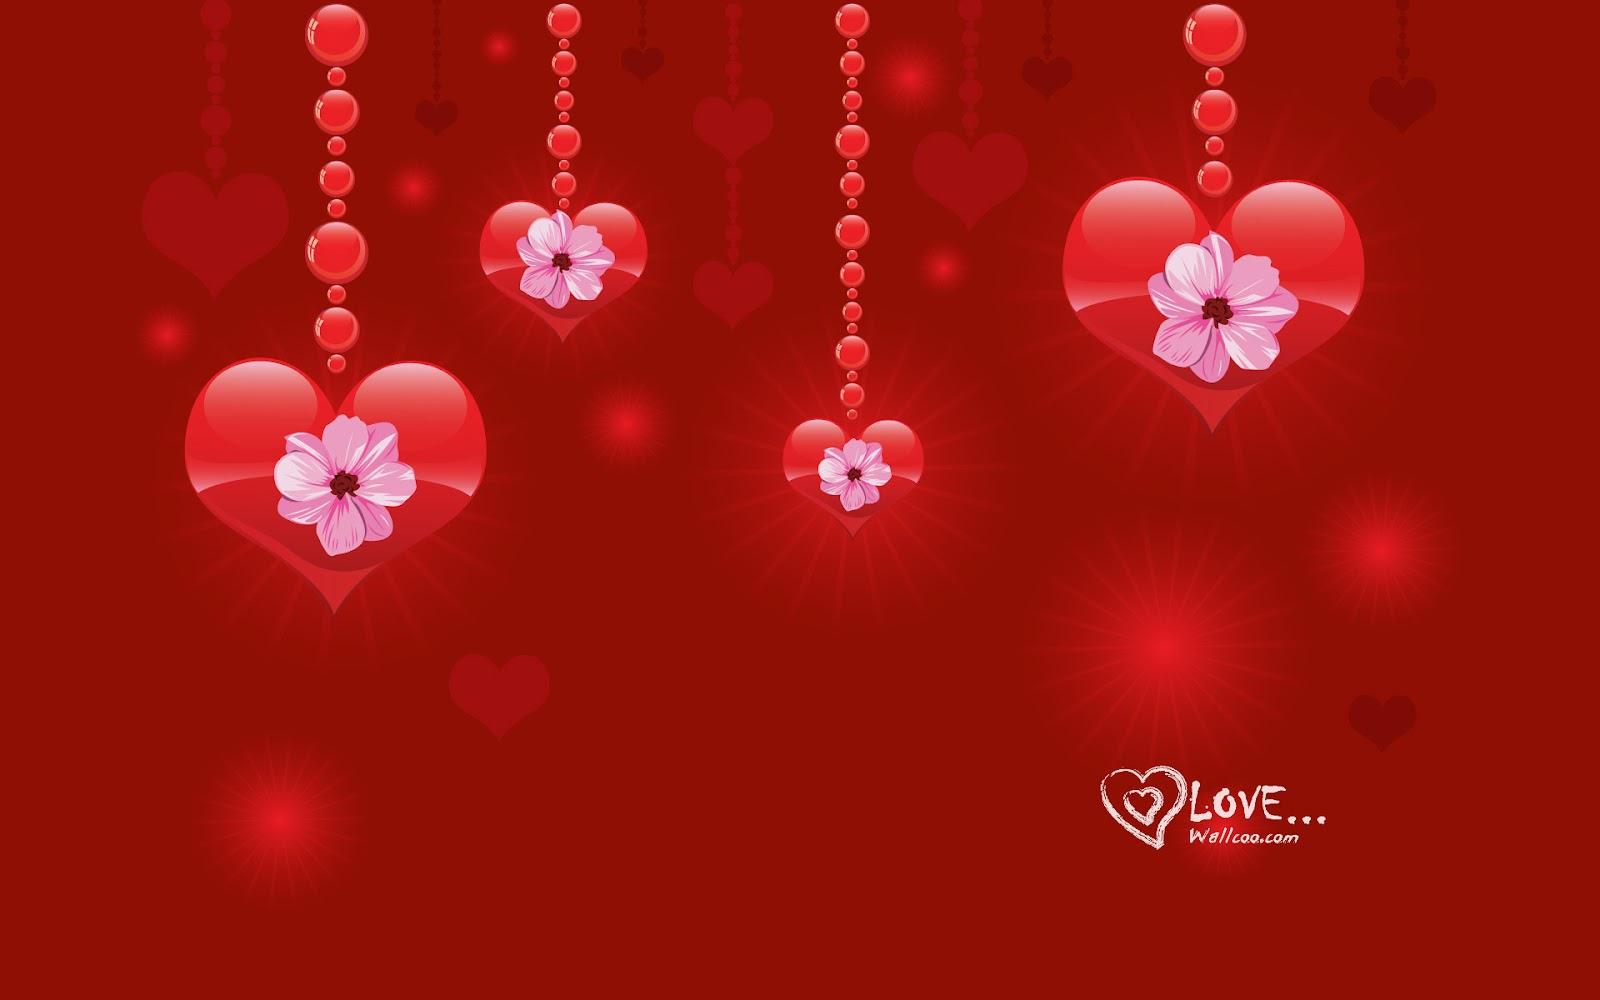 heart wallpapers | red heart wallpapers | red love heart ...